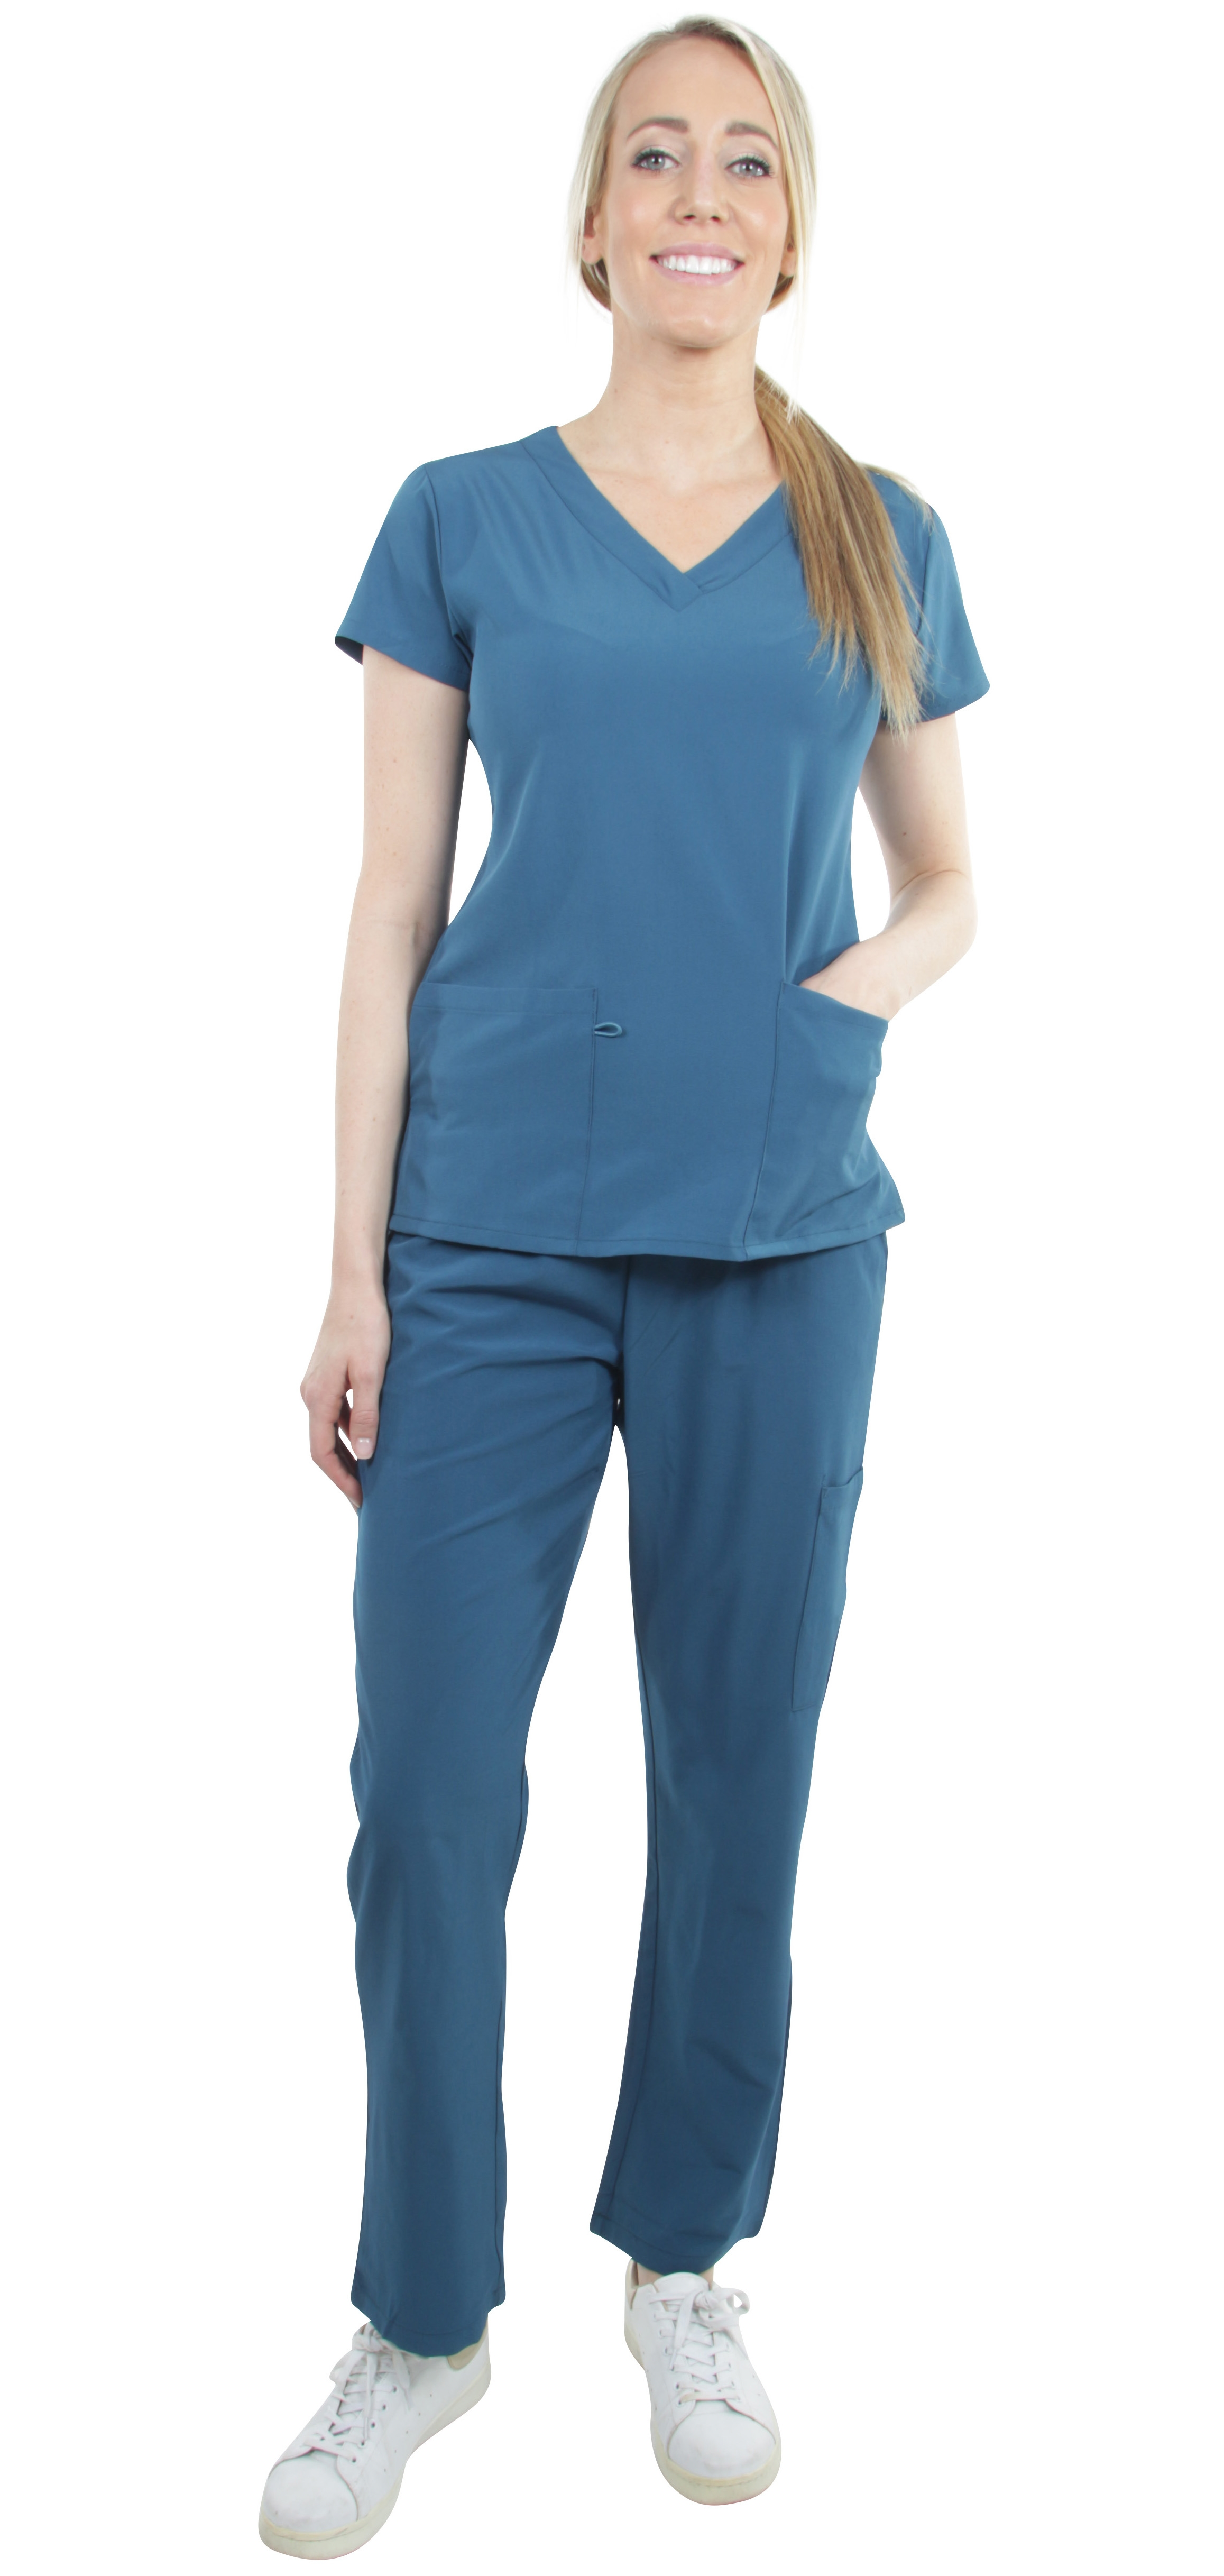 Unisex-Performance-Stretch-Medical-Uniform-Five-Pockets-V-Neck-Scrubs-Sets miniature 19